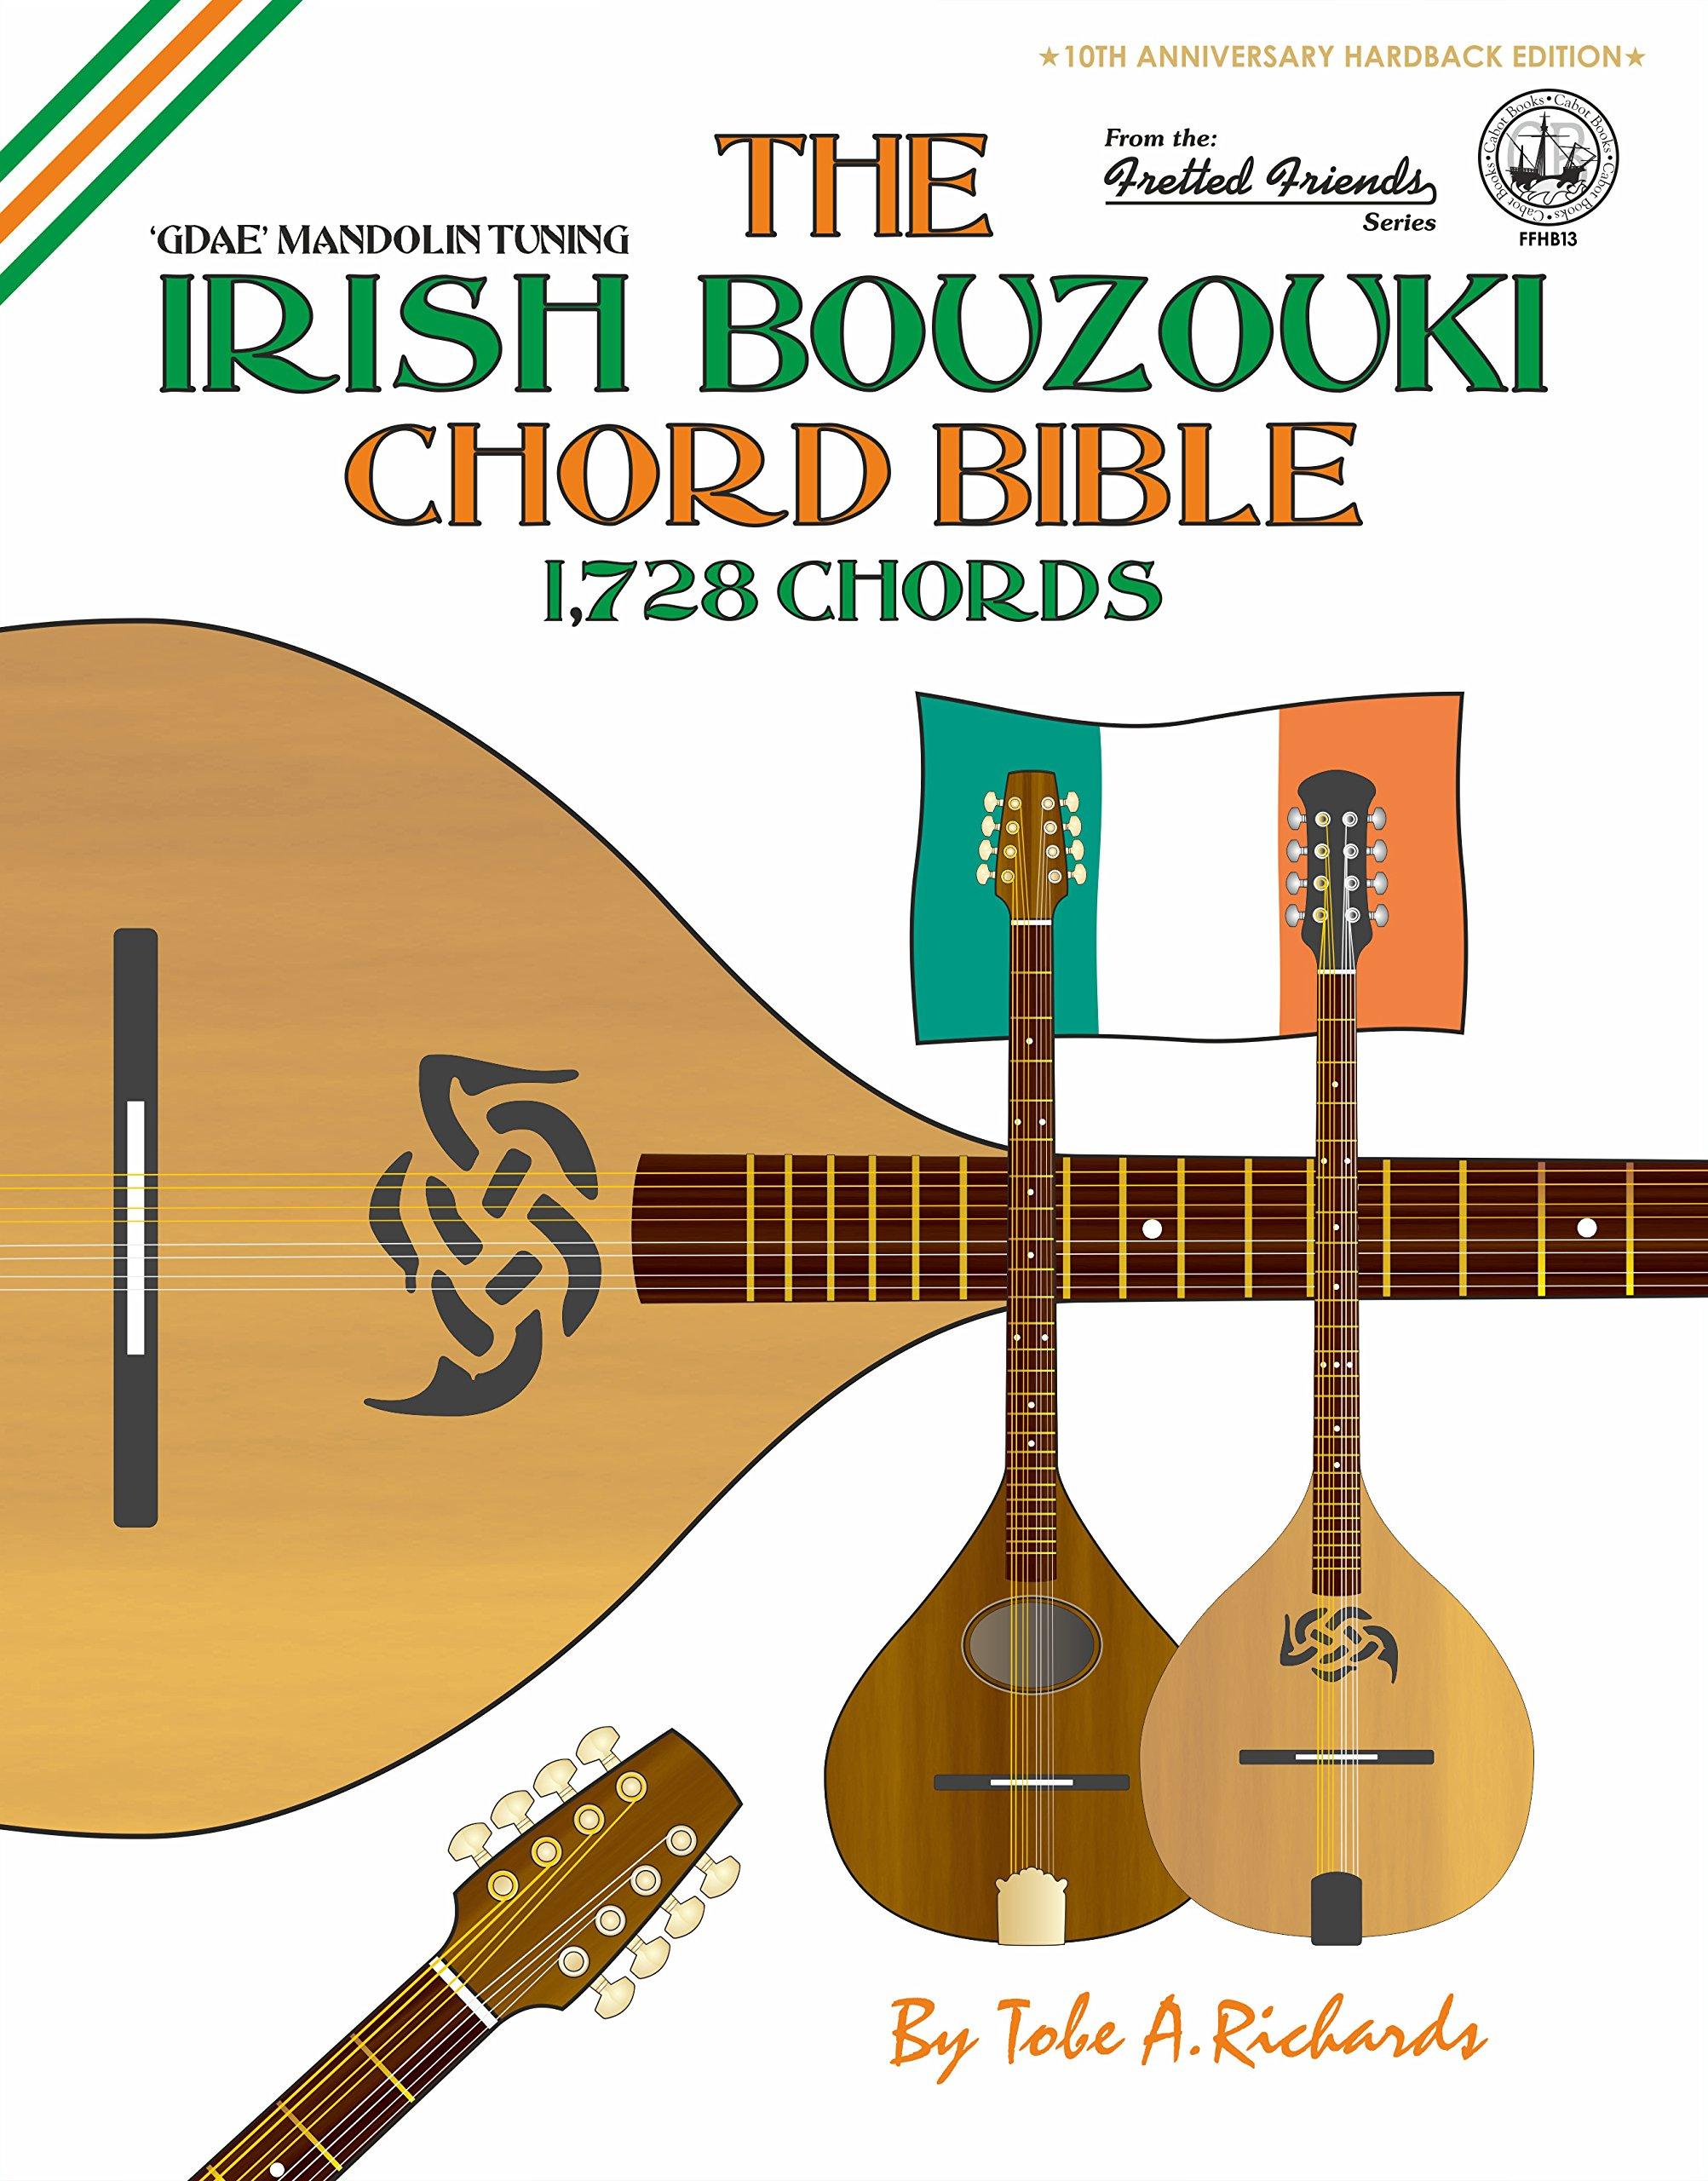 The Irish Bouzouki Chord Bible: GDAE Mandolin Tuning 1,728 Chords (Fretted Friends Series)